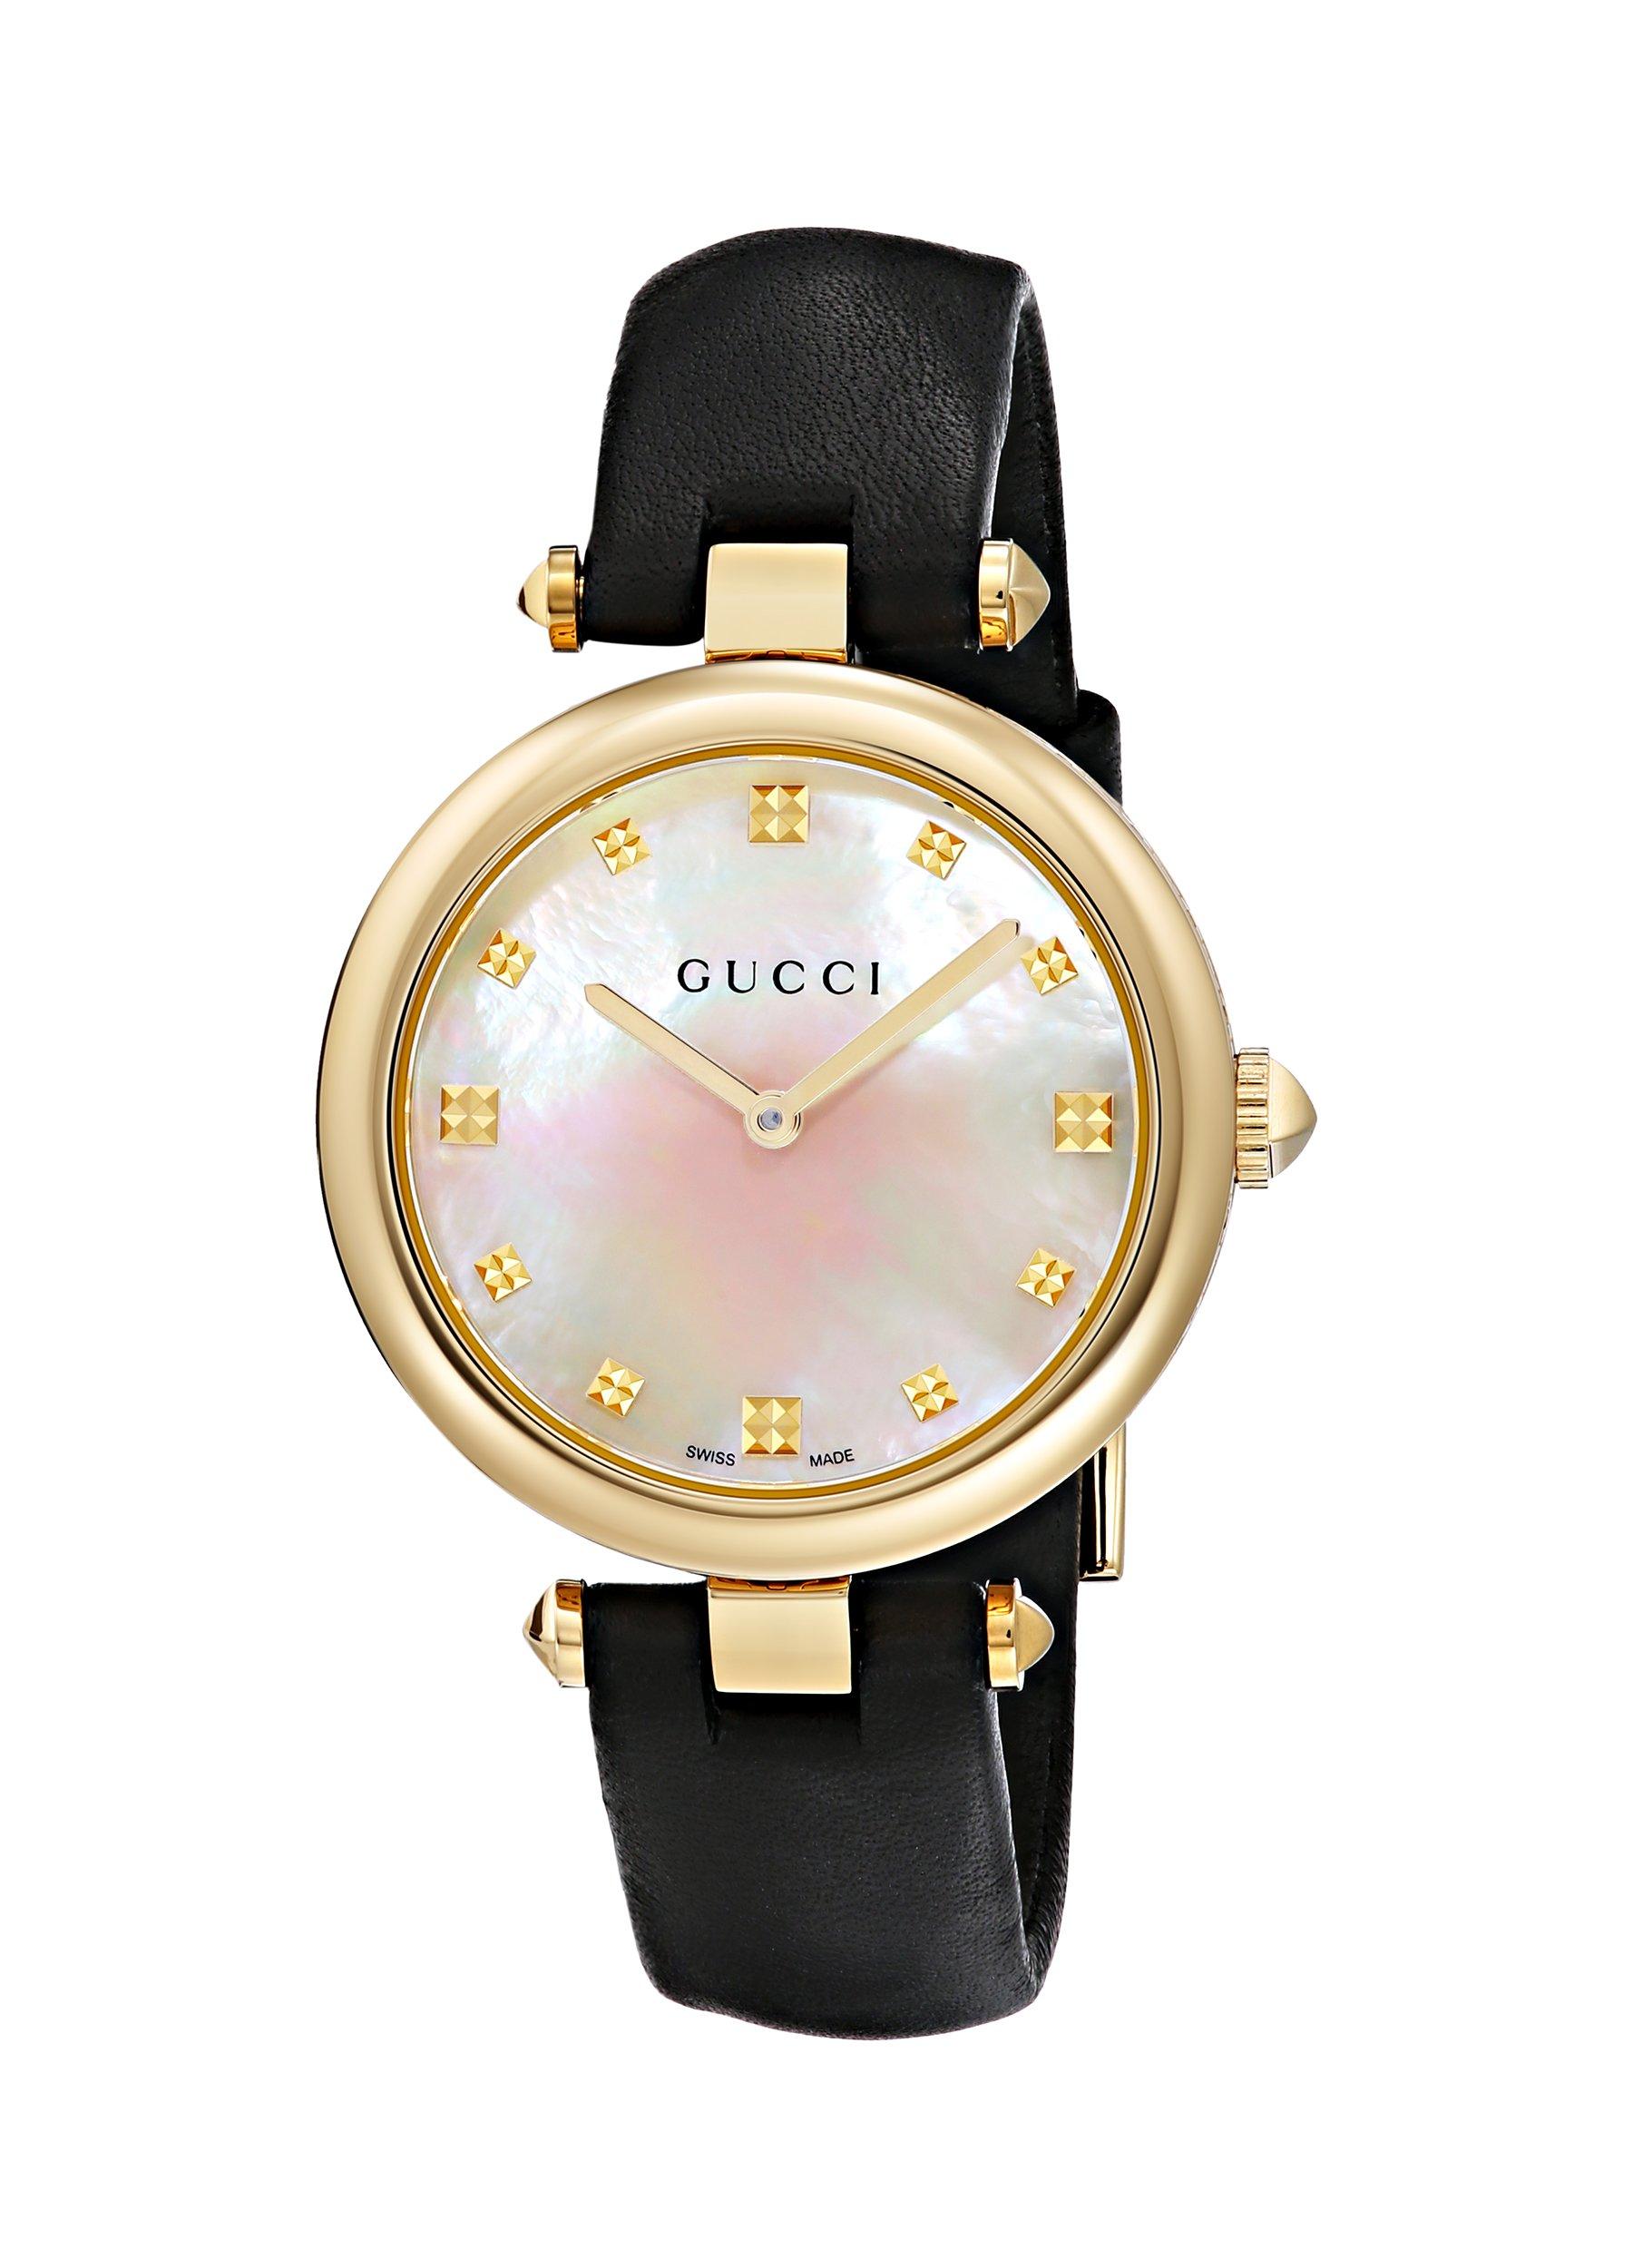 Gucci Swiss Quartz Gold-Tone and Leather Dress Black Women's Watch(Model: YA141404)